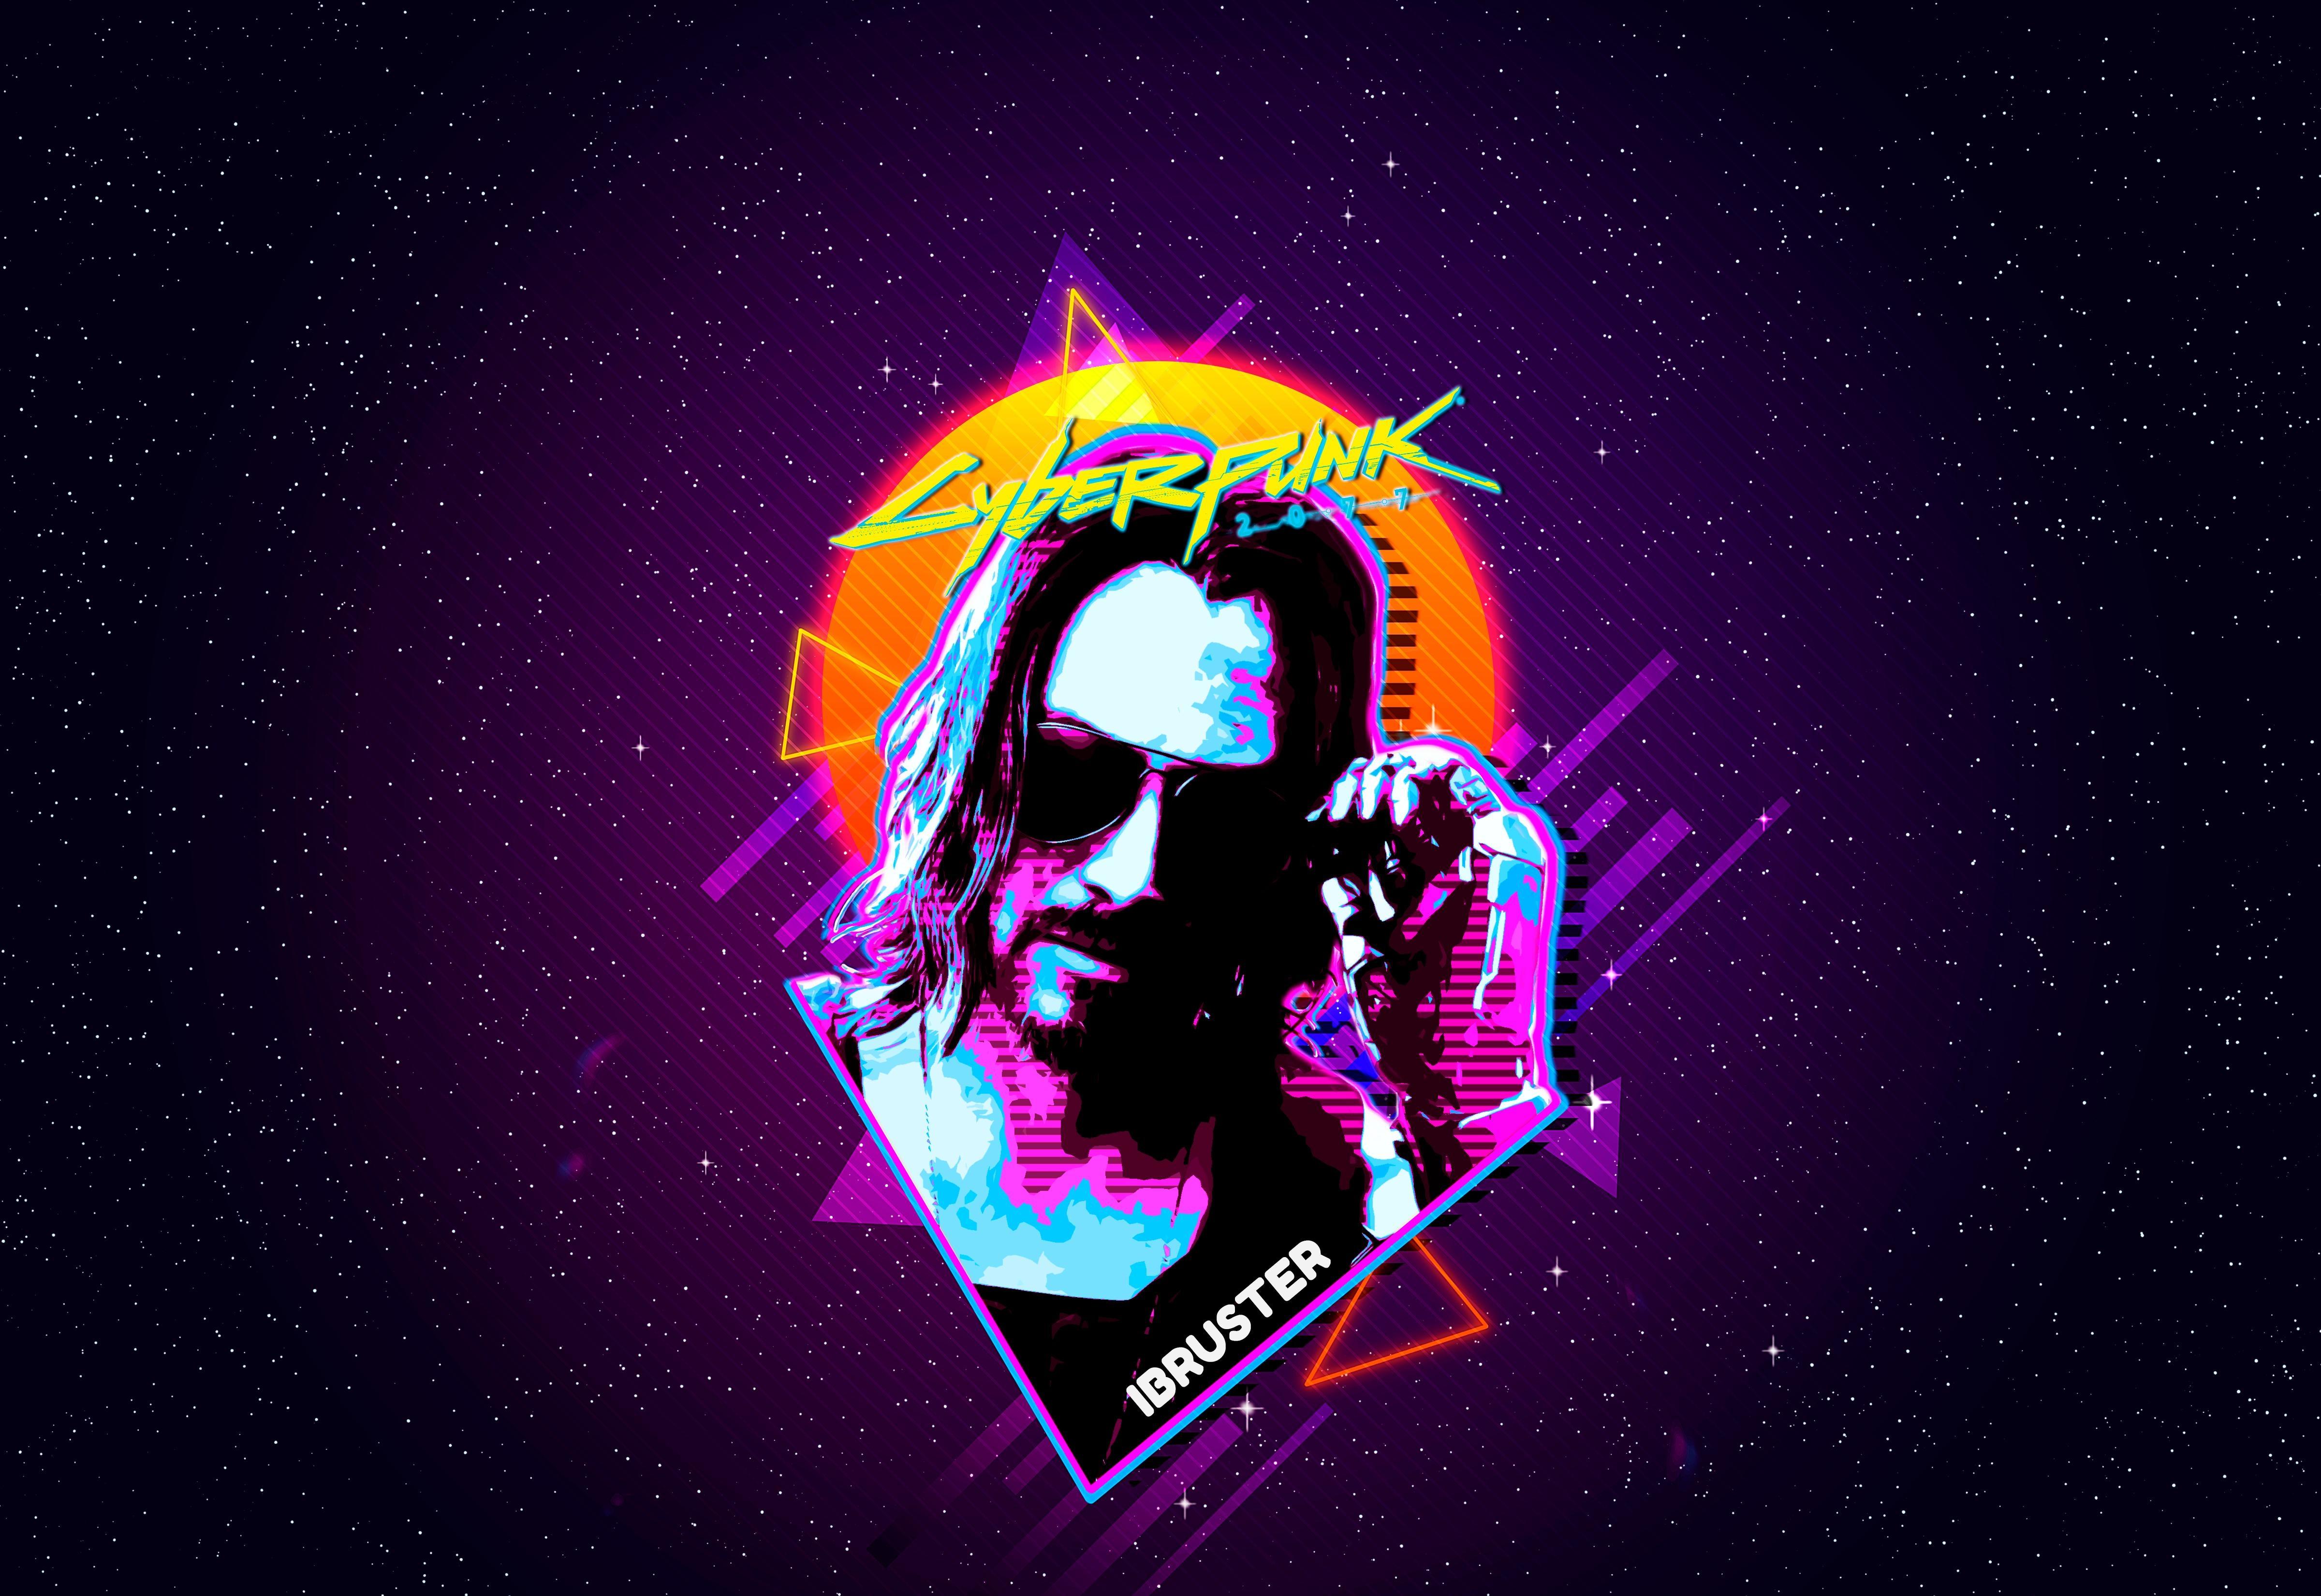 Keanu Reeves Cyberpunk 2077 Retro Art Wallpaper, HD Artist ...